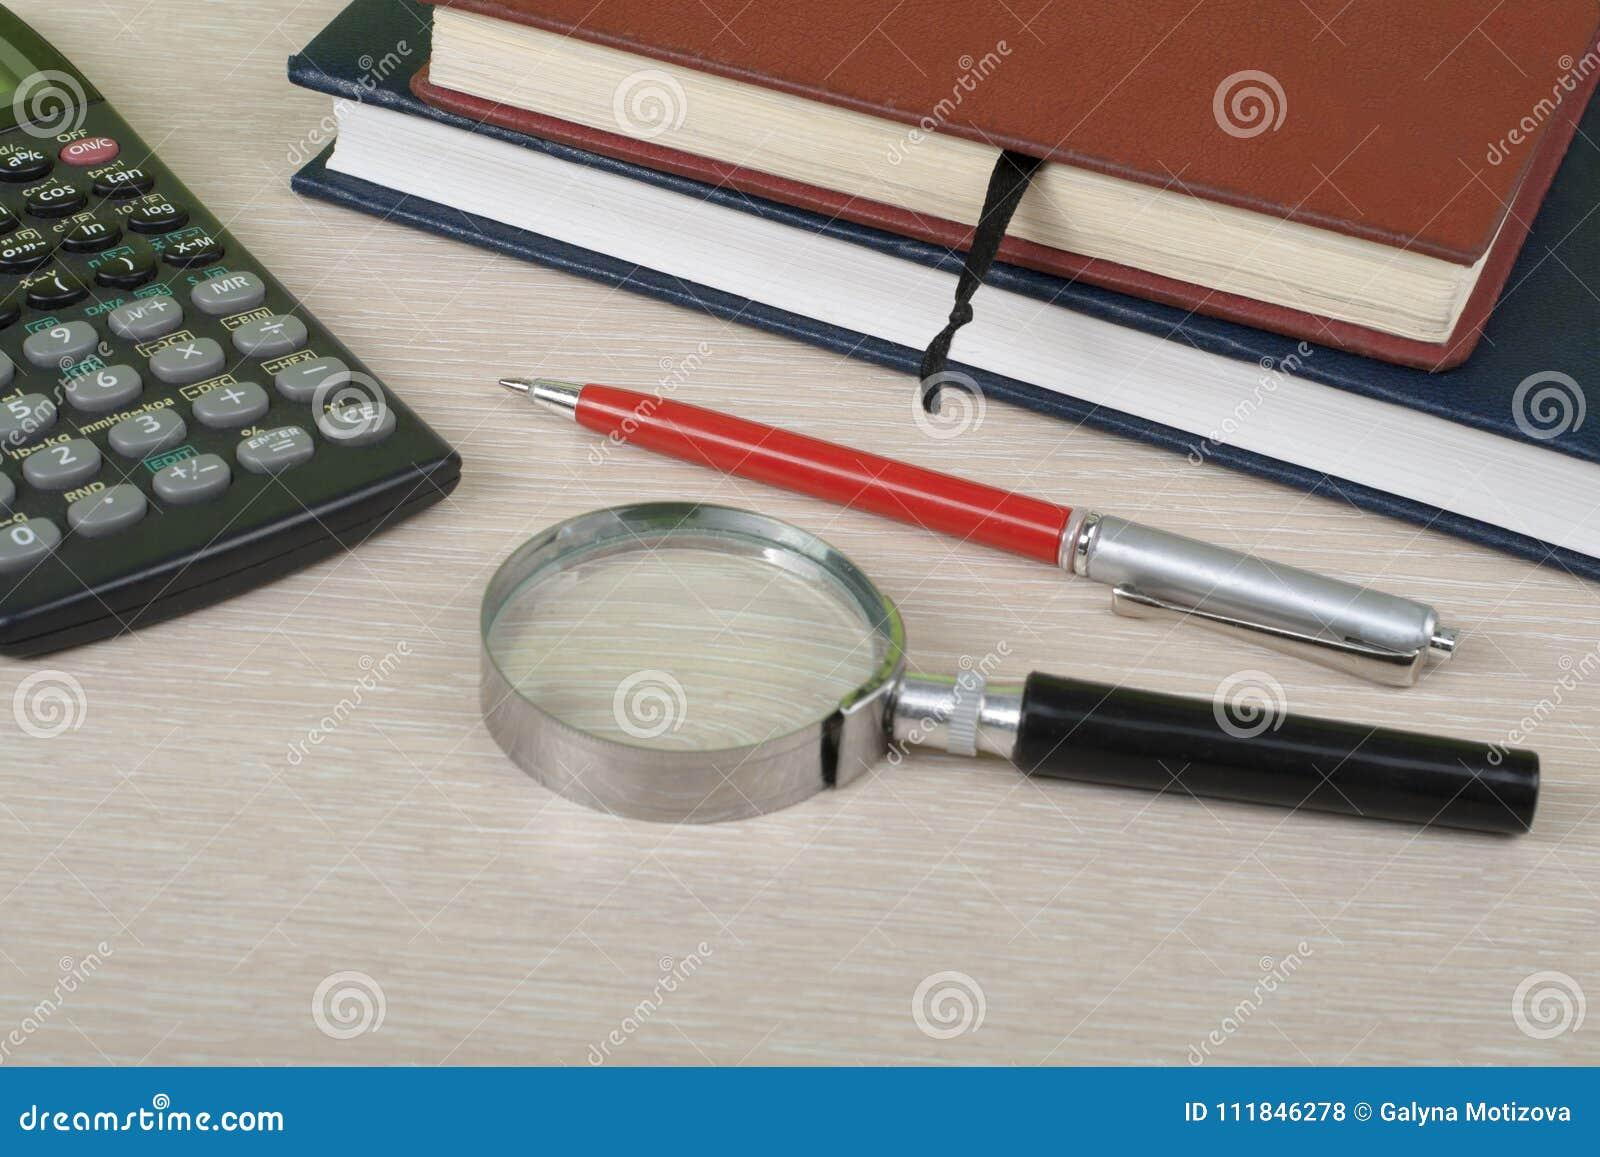 home savings budget concept notepad pen calculator magnifying